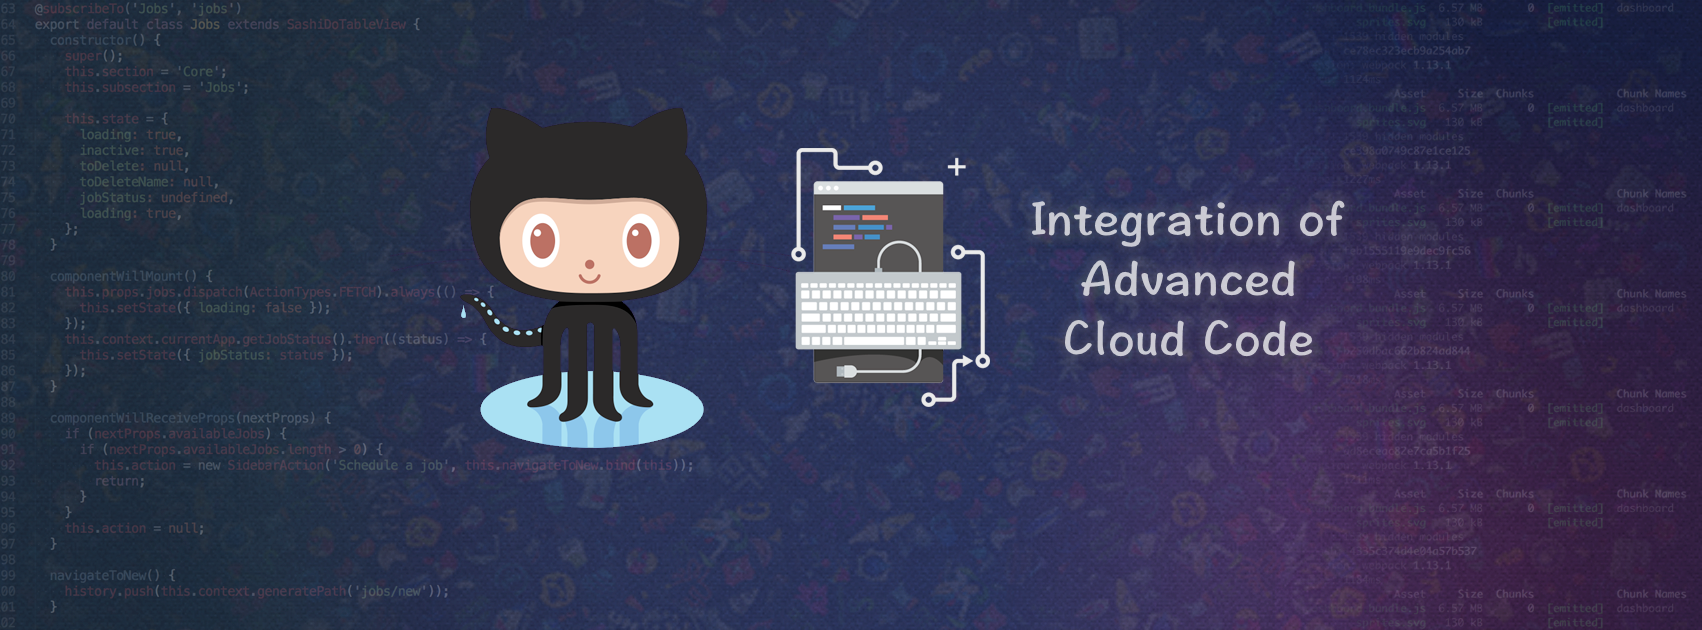 GitHub integration of Advanced Cloud Code part 1